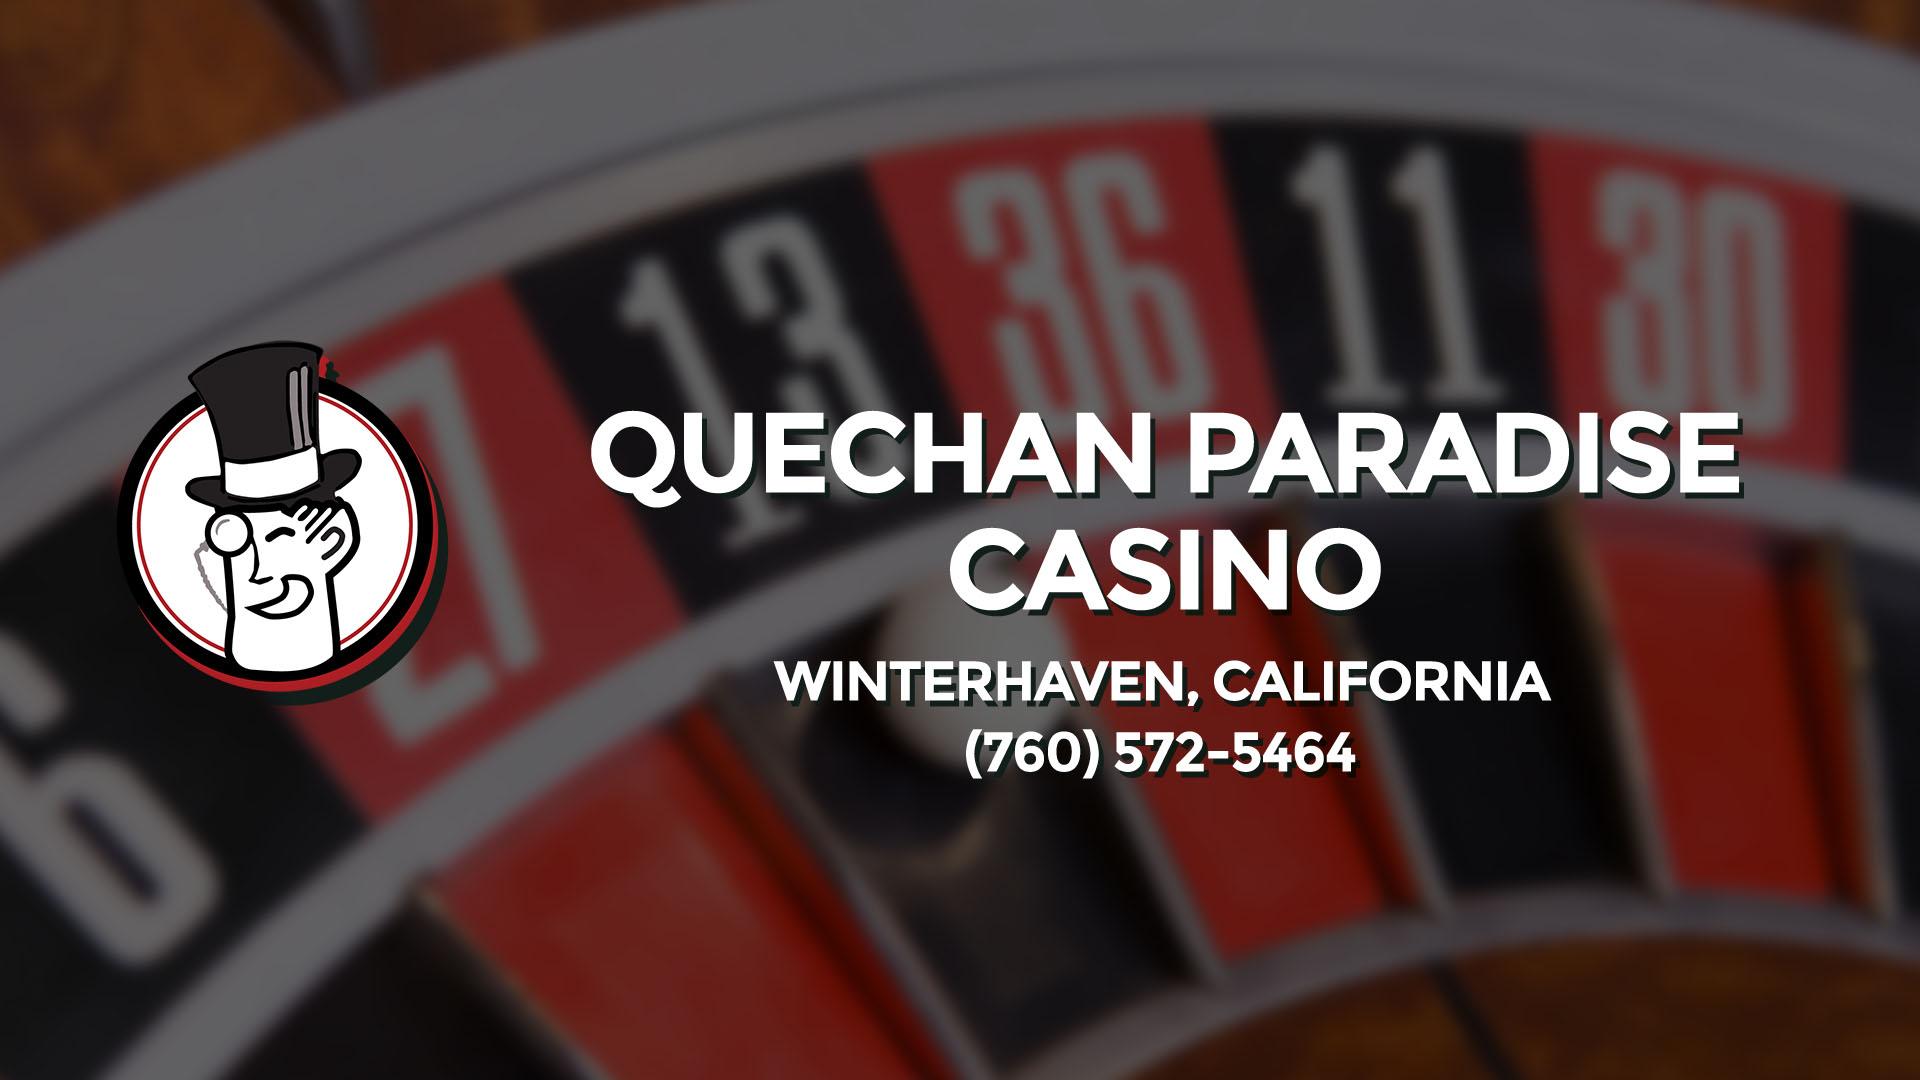 QUECHAN PARADISE CASINO WINTERHAVEN CA